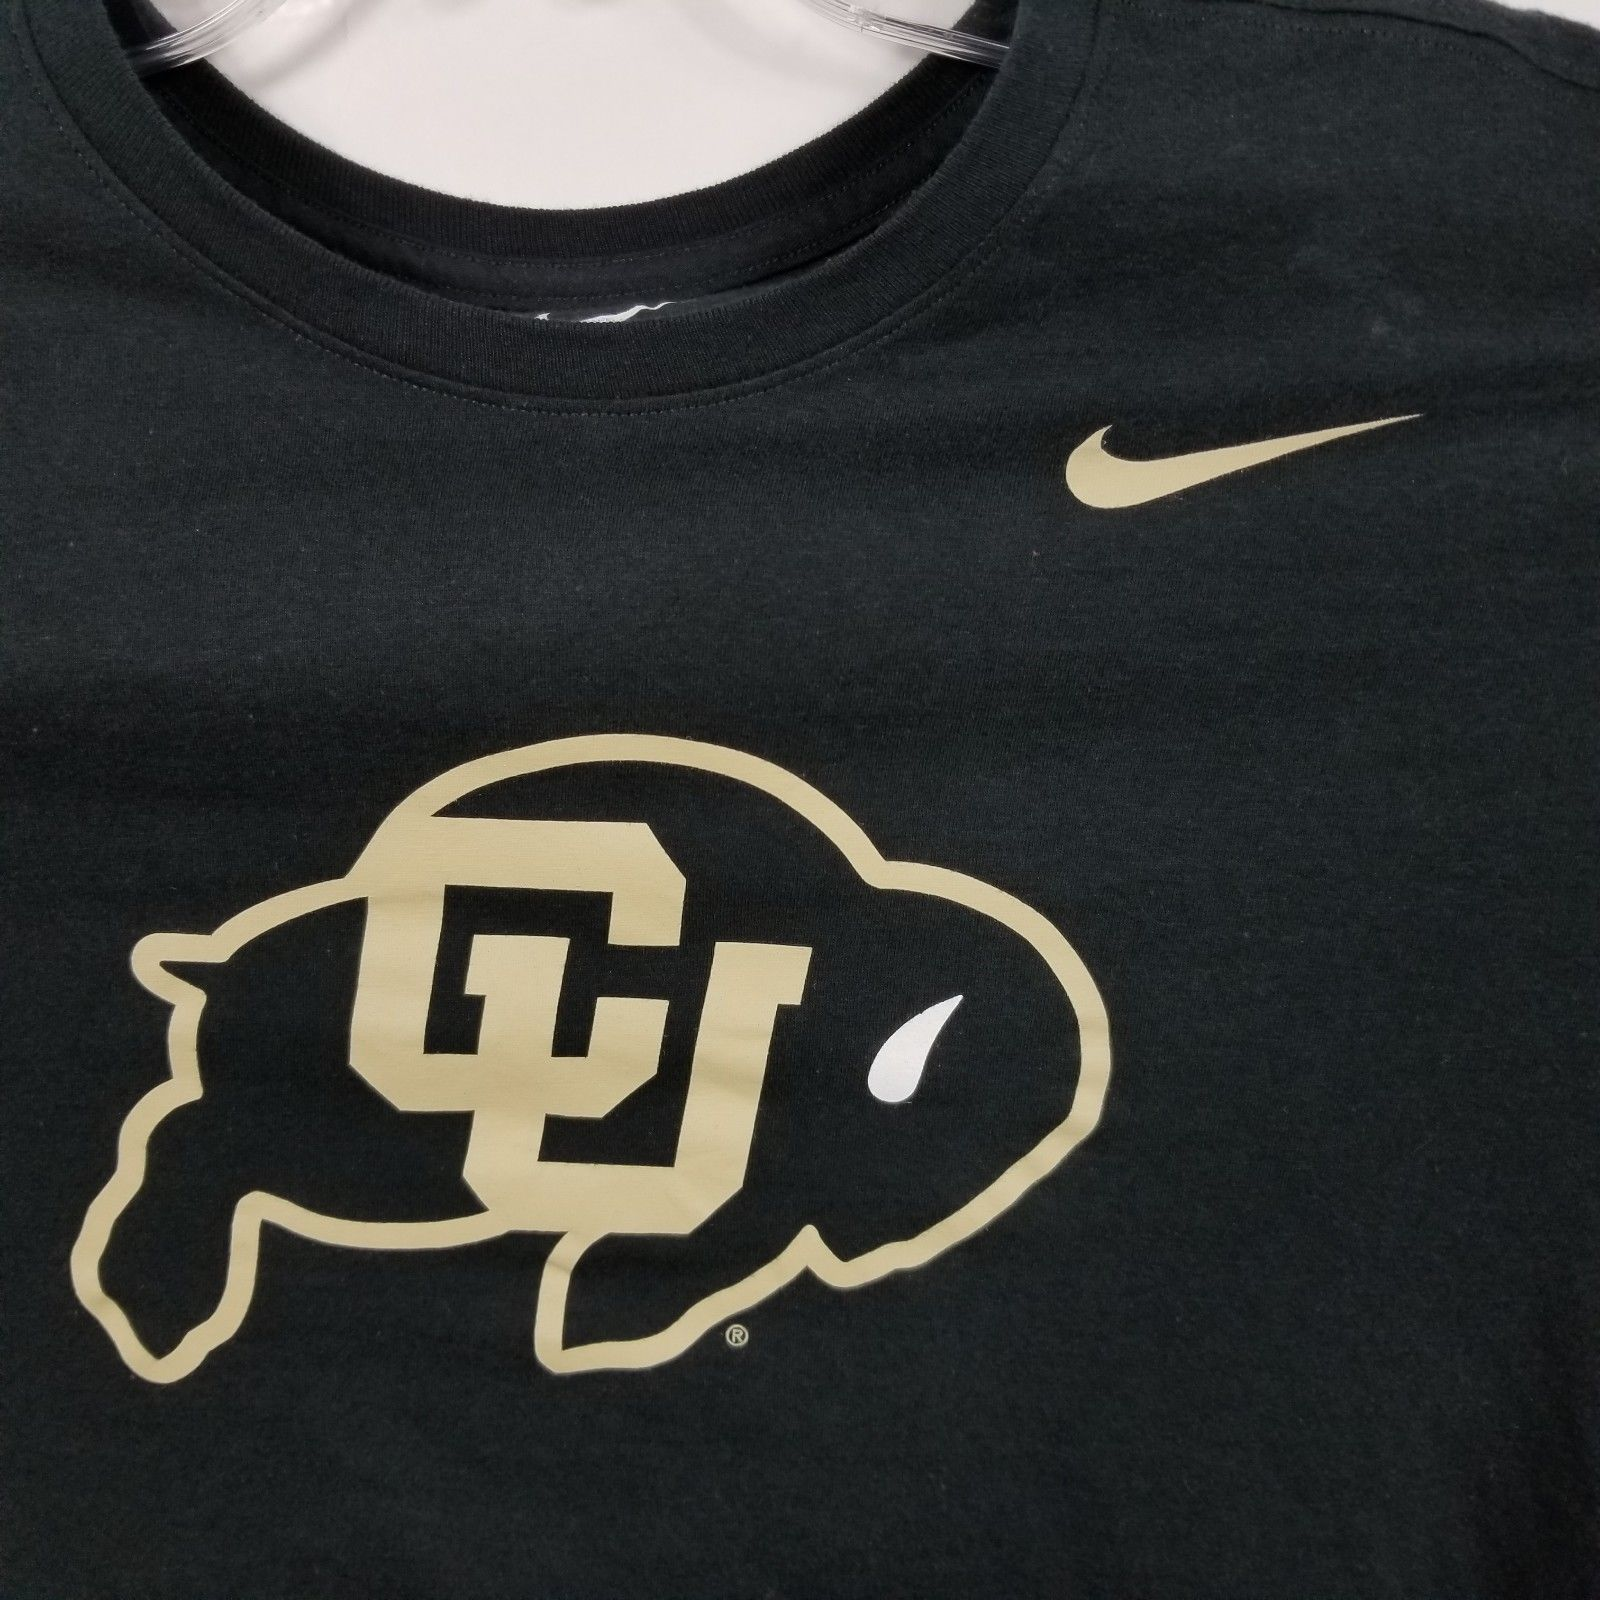 Nike Mens Colorado Buffaloes T Shirt Sz L Large Black Gold Solid Short  Sleeve 5127cc20c